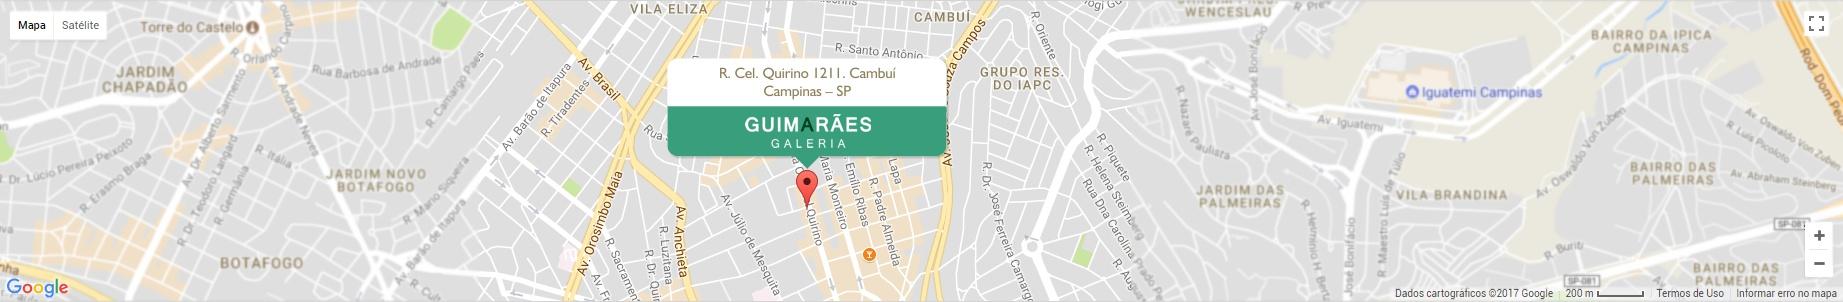 mapa guimaraes galeria cambui campinas